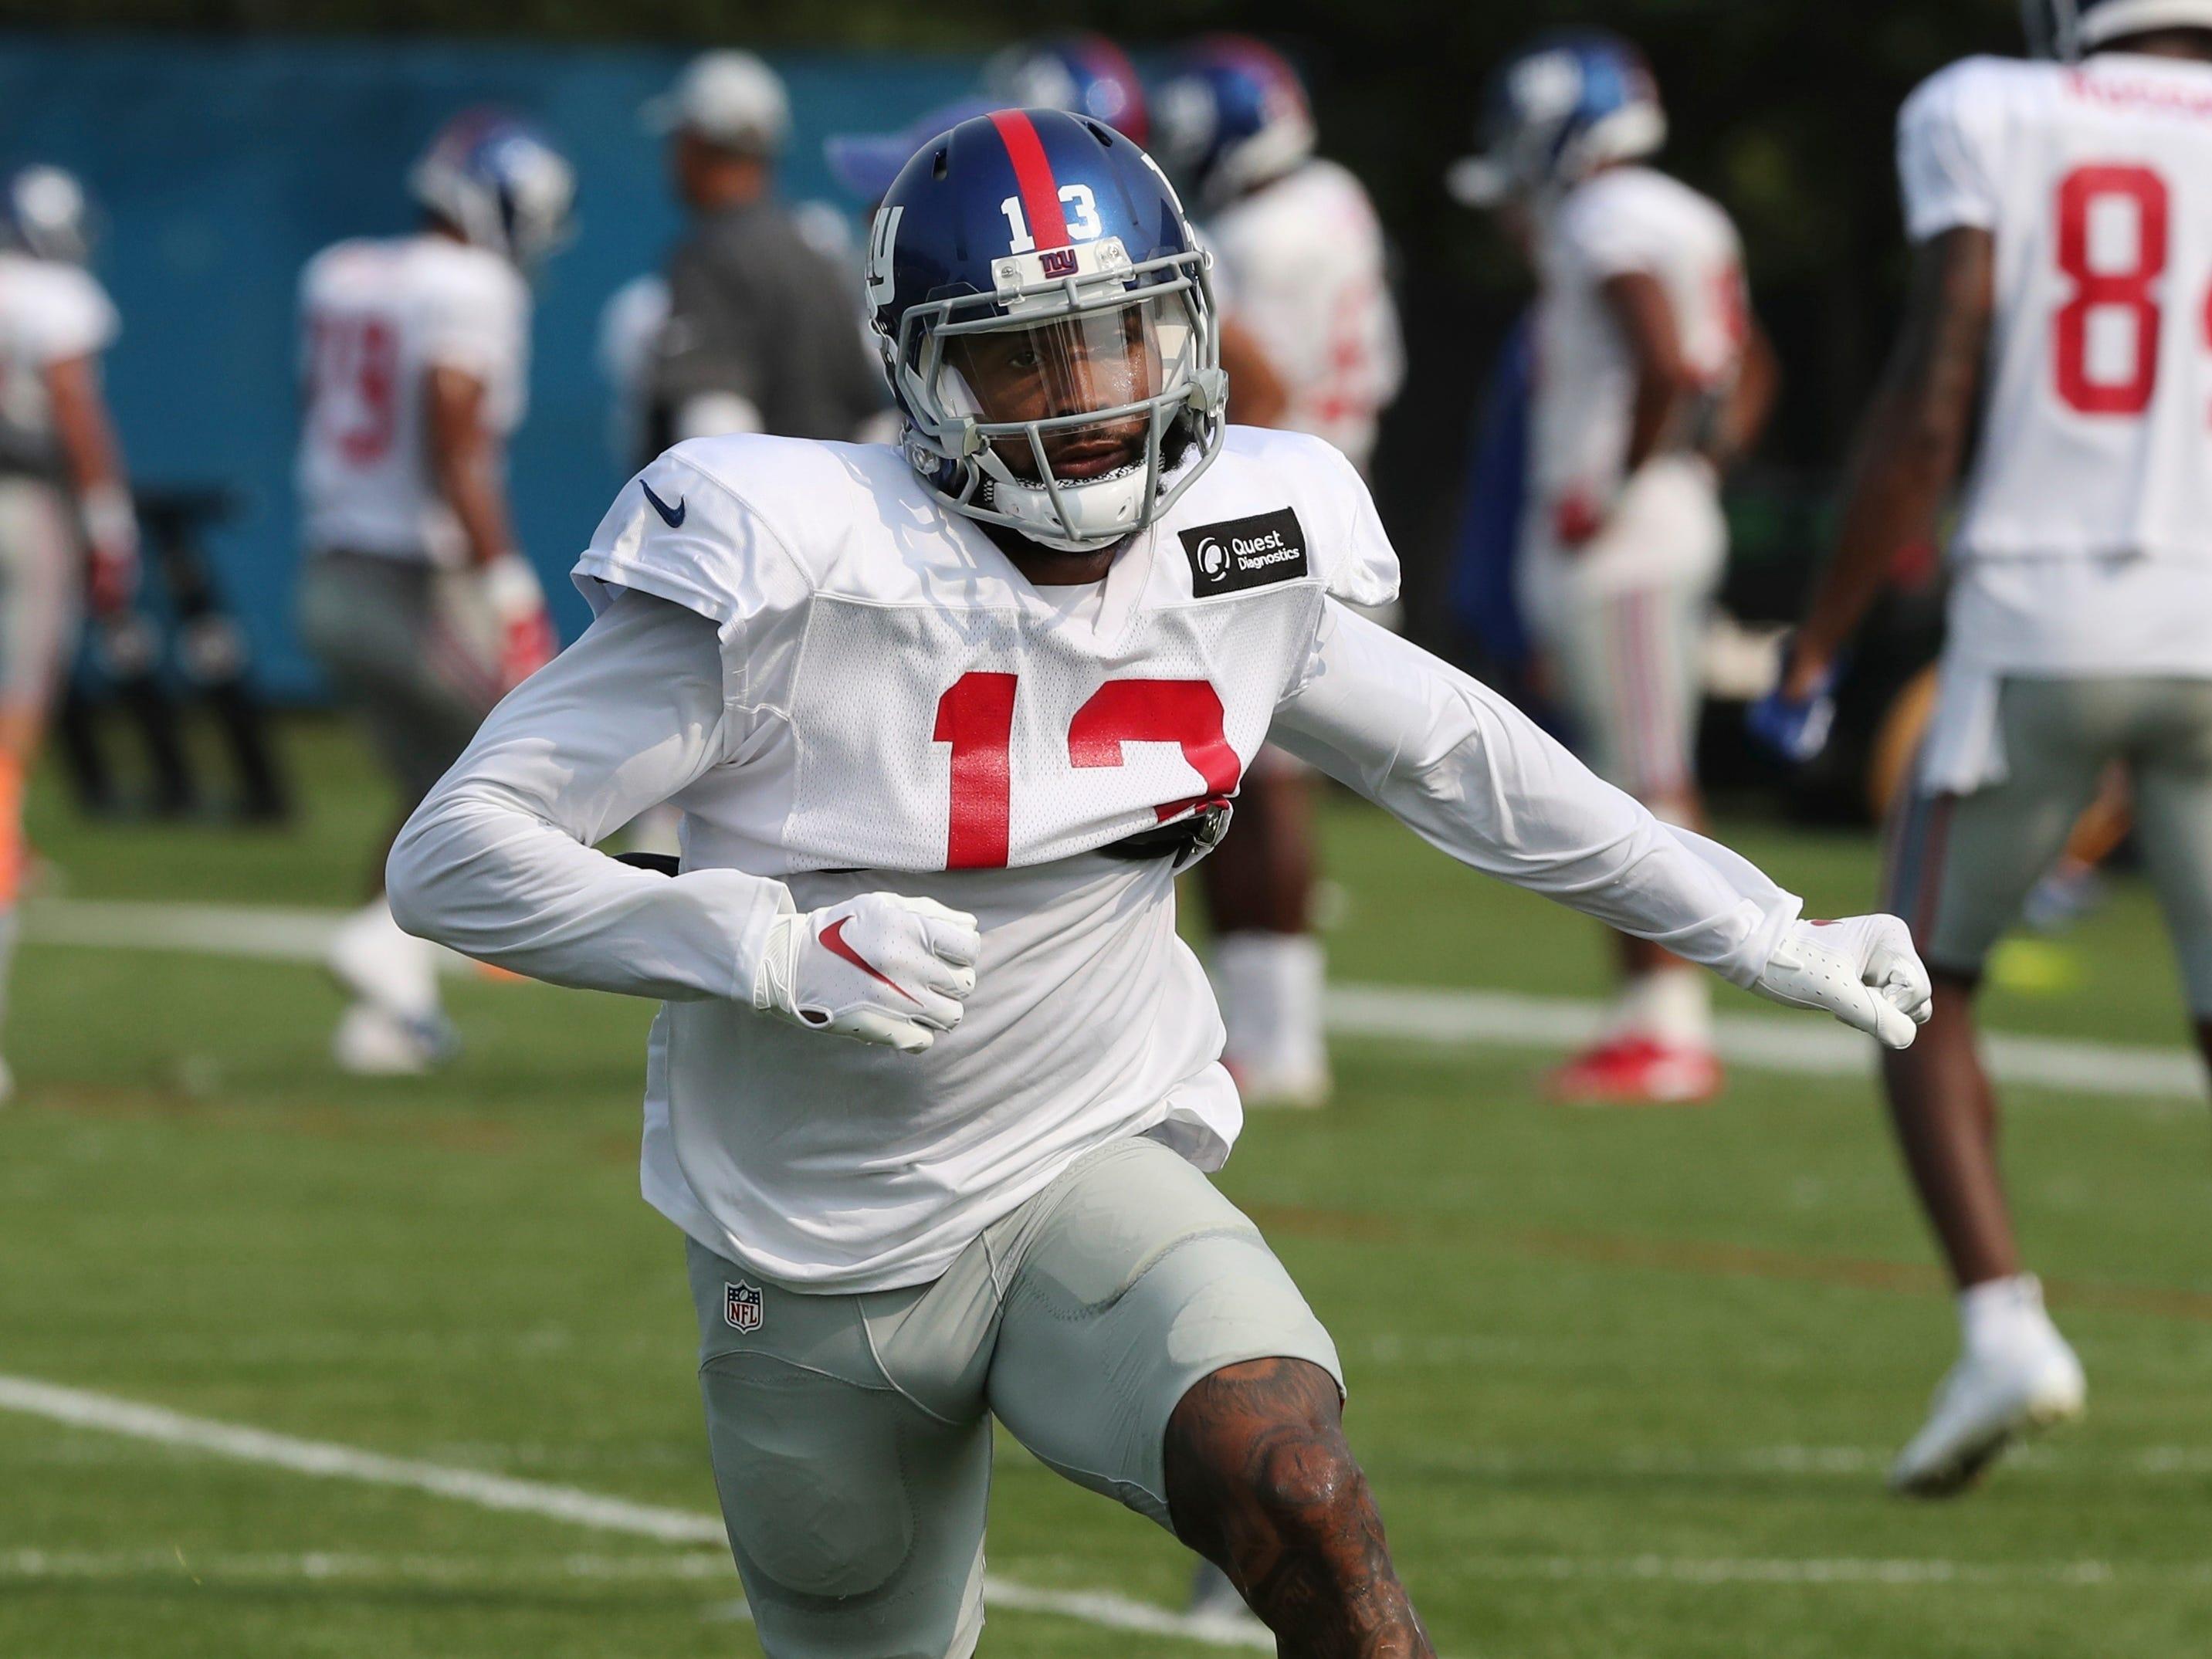 New York Giants receiver Odell Beckham Jr., runs through a drill at the Detroit Lions football camp.